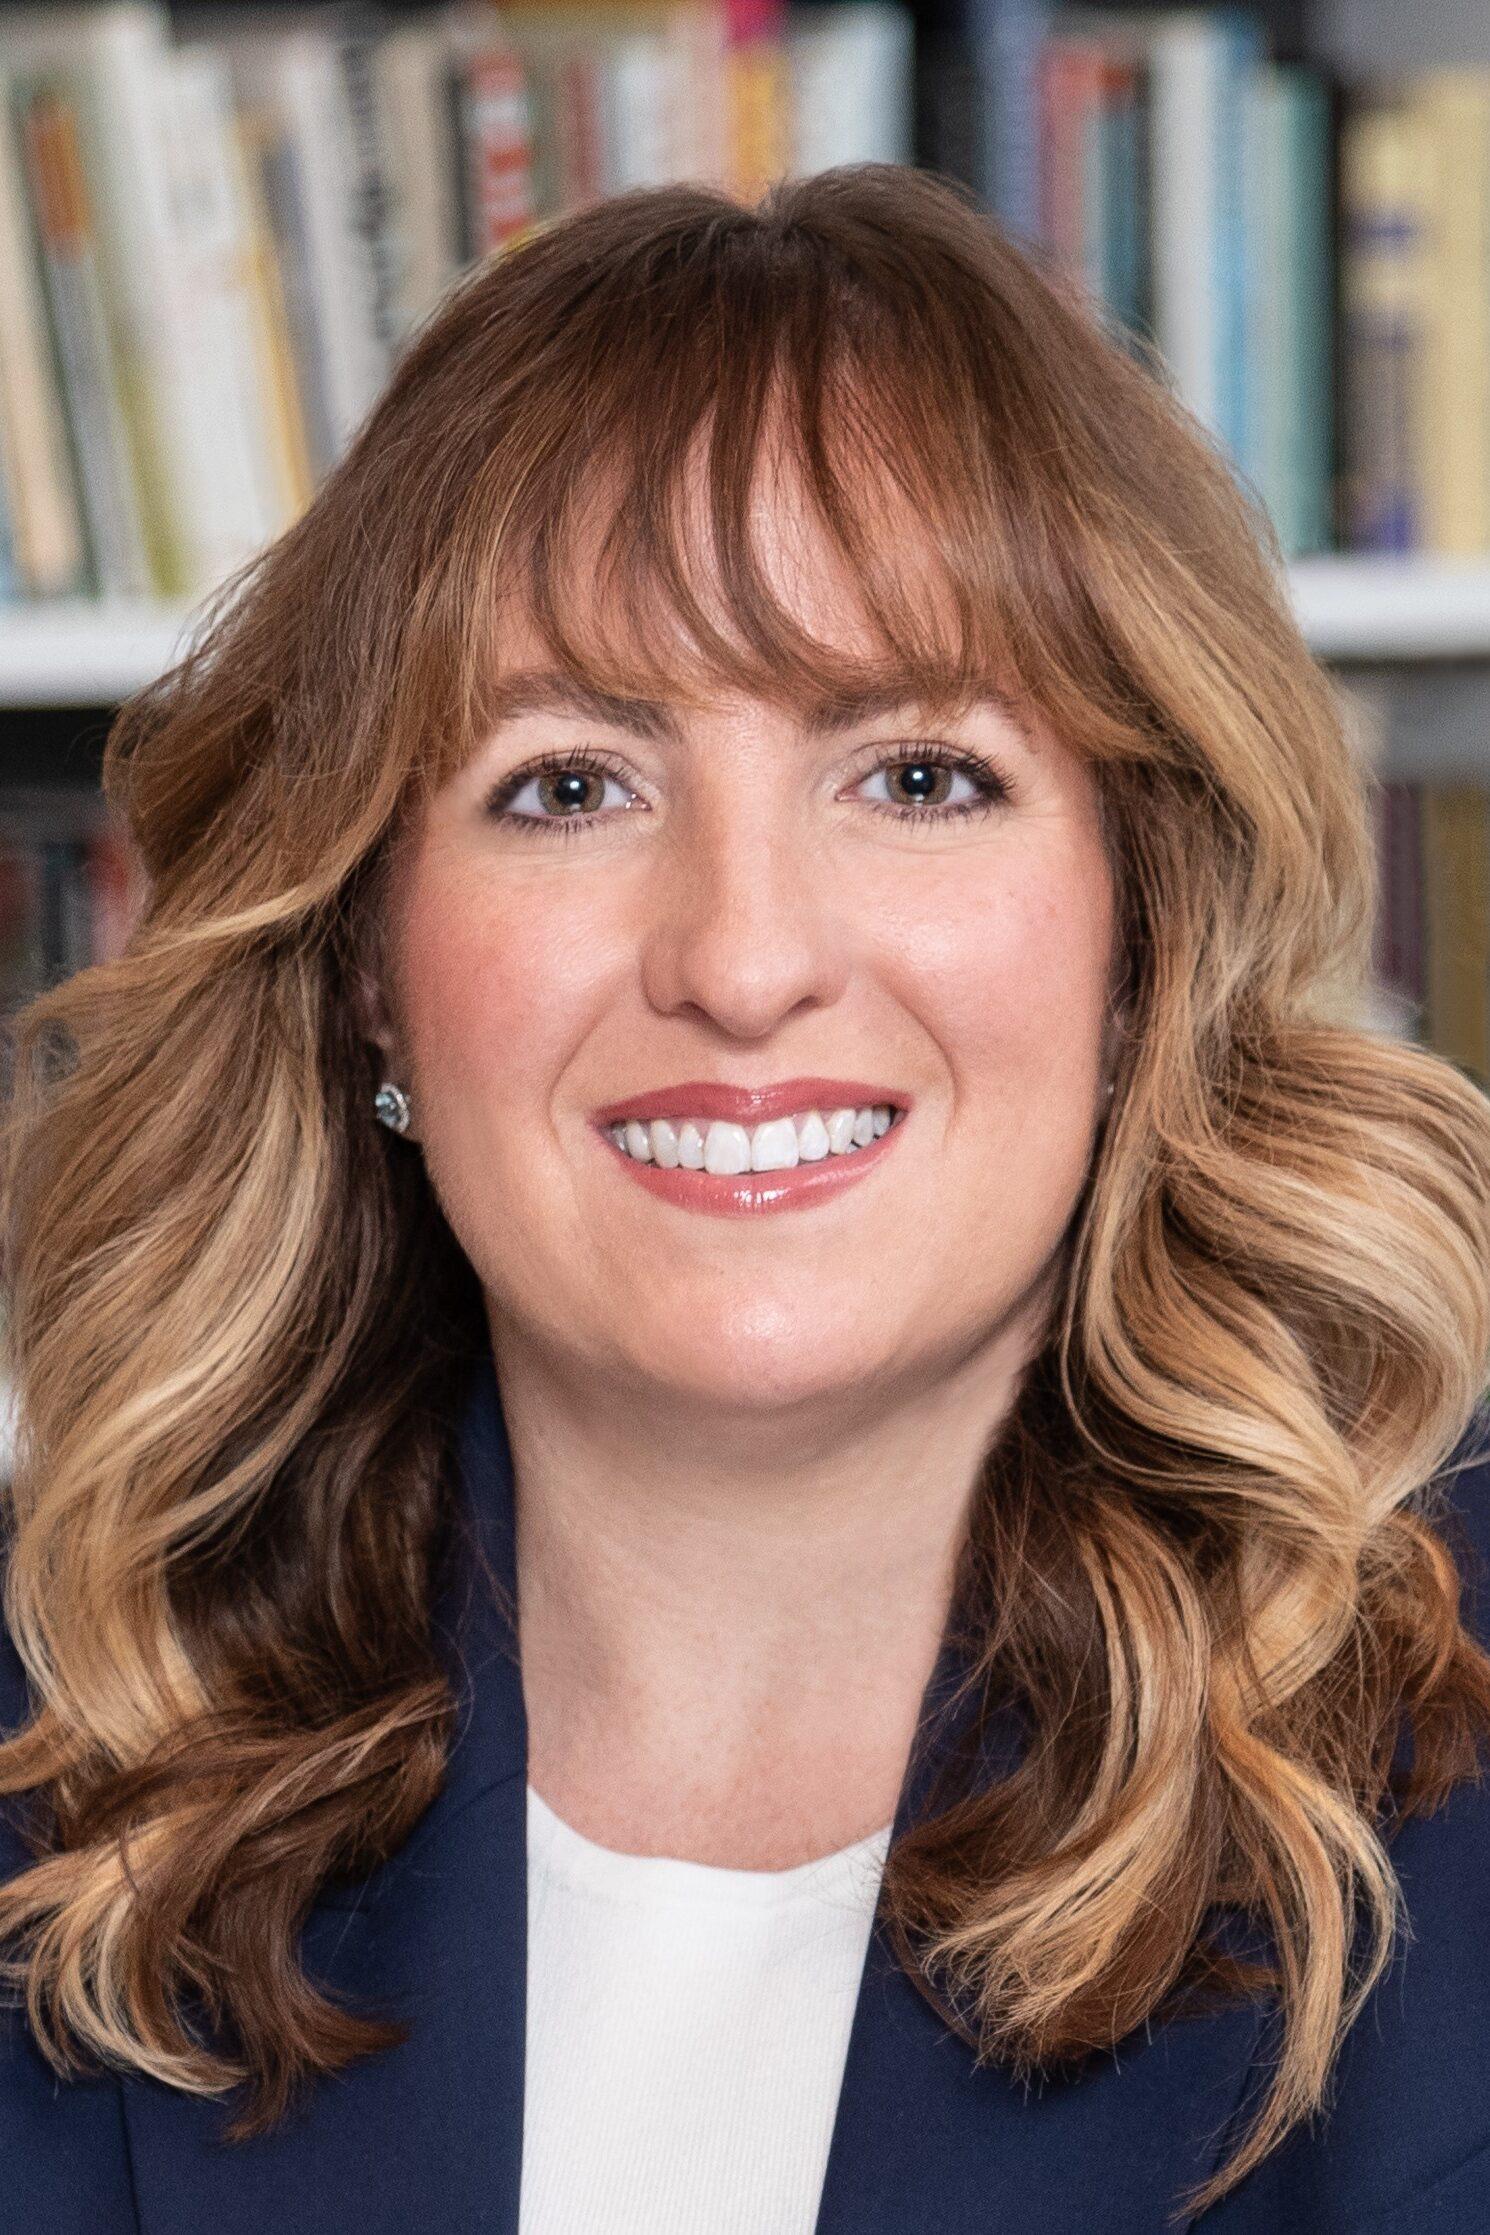 Kelly Castriotta (Speaker)